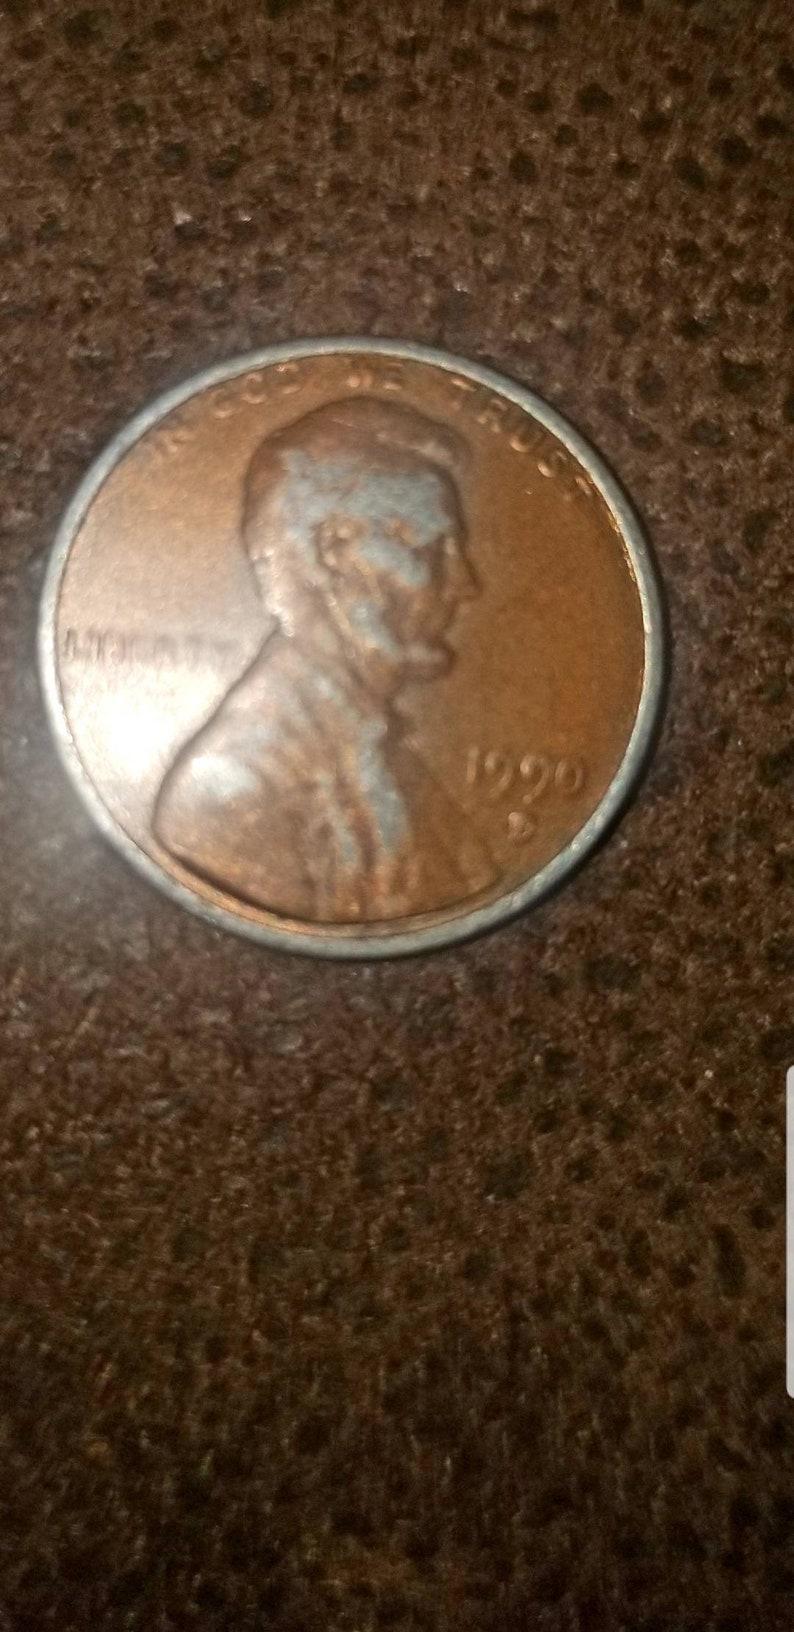 1990 zinc error penny wrong planchet